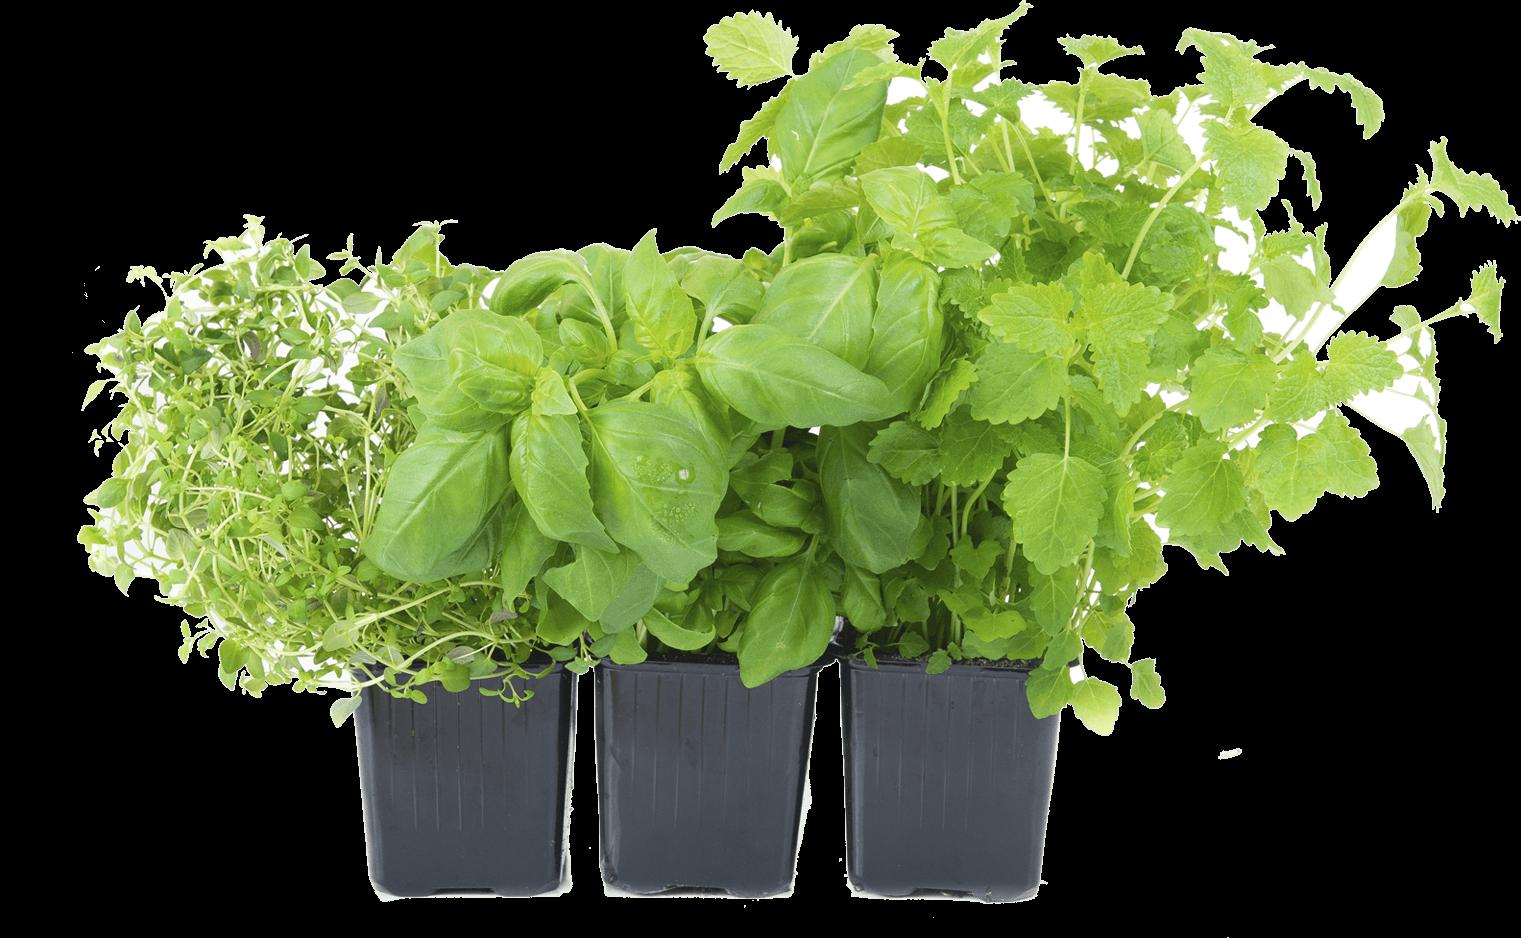 Garden clipart herb garden. Png transparent images all